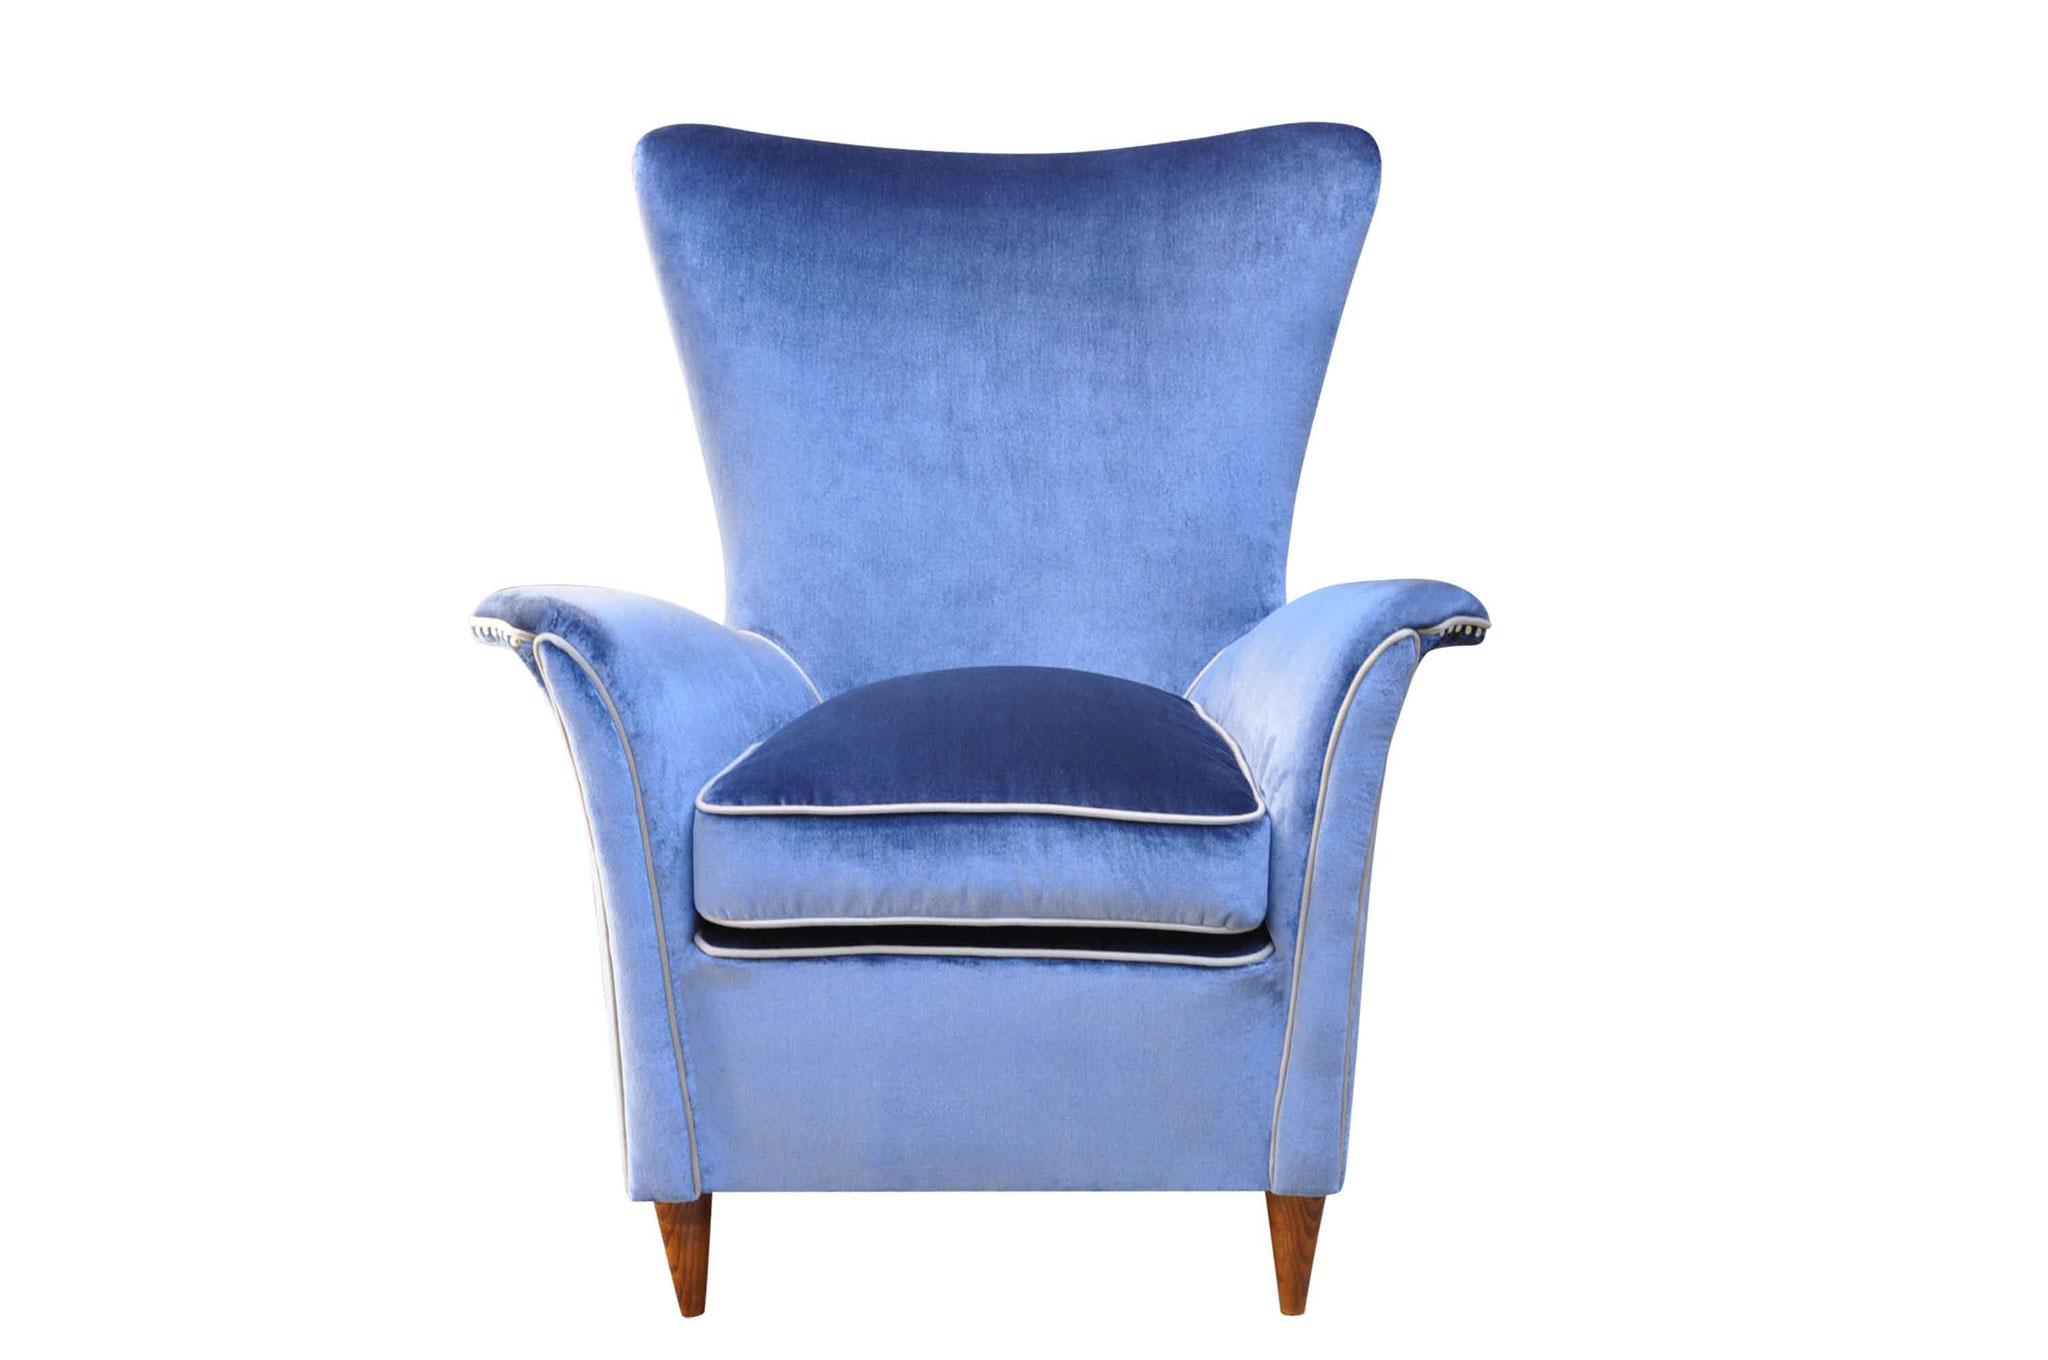 isa gio ponti mid century chair 1940s